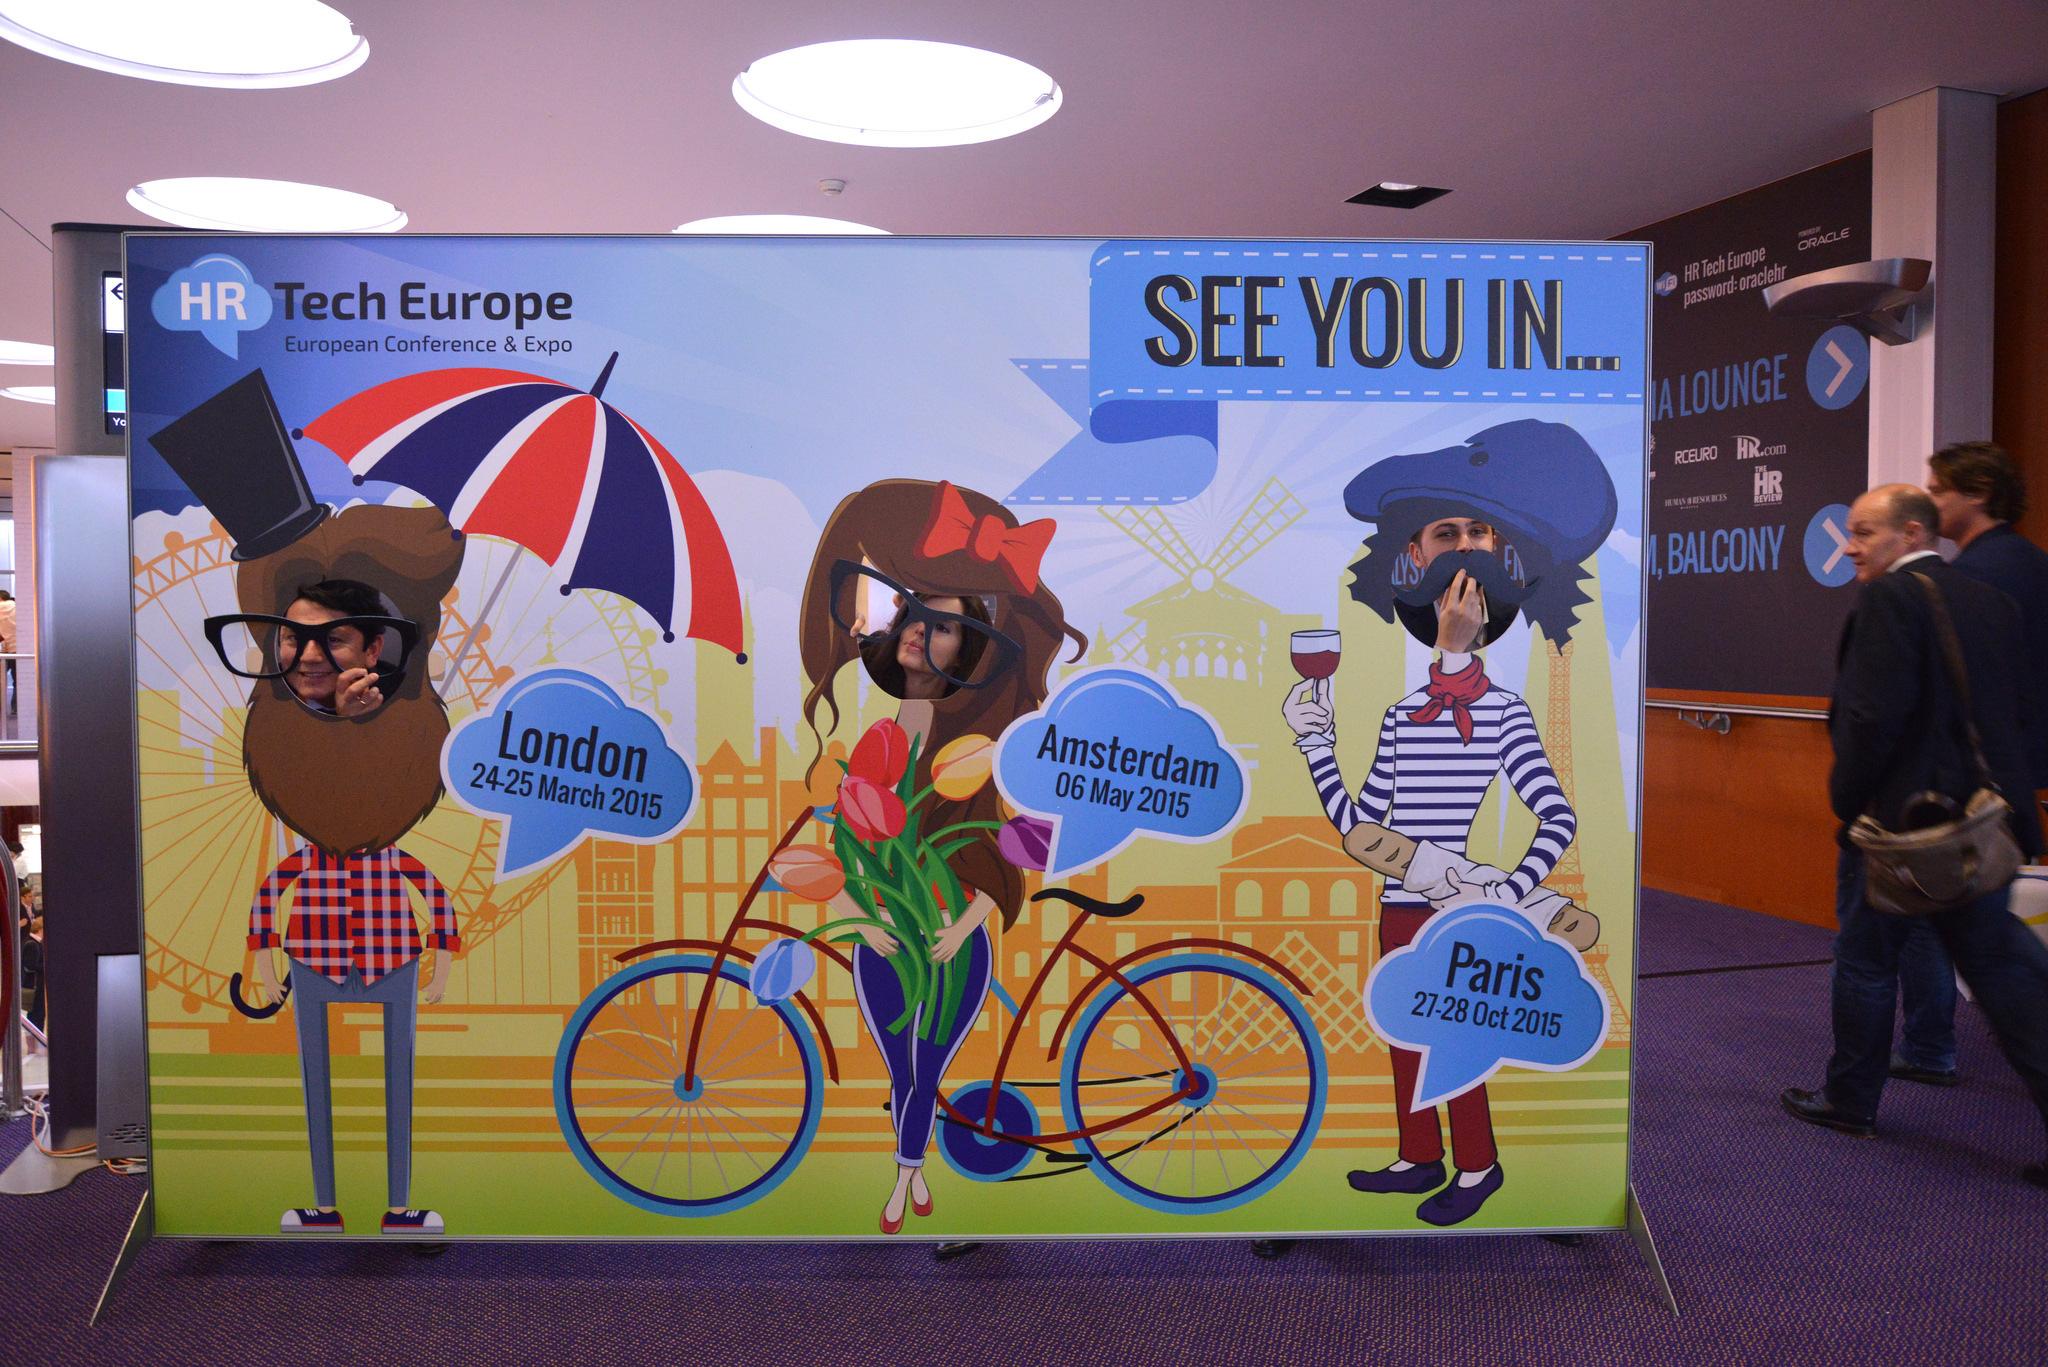 London-Amsterdam-&-Paris-in-2015-for-HR-Tech-Europe-2014